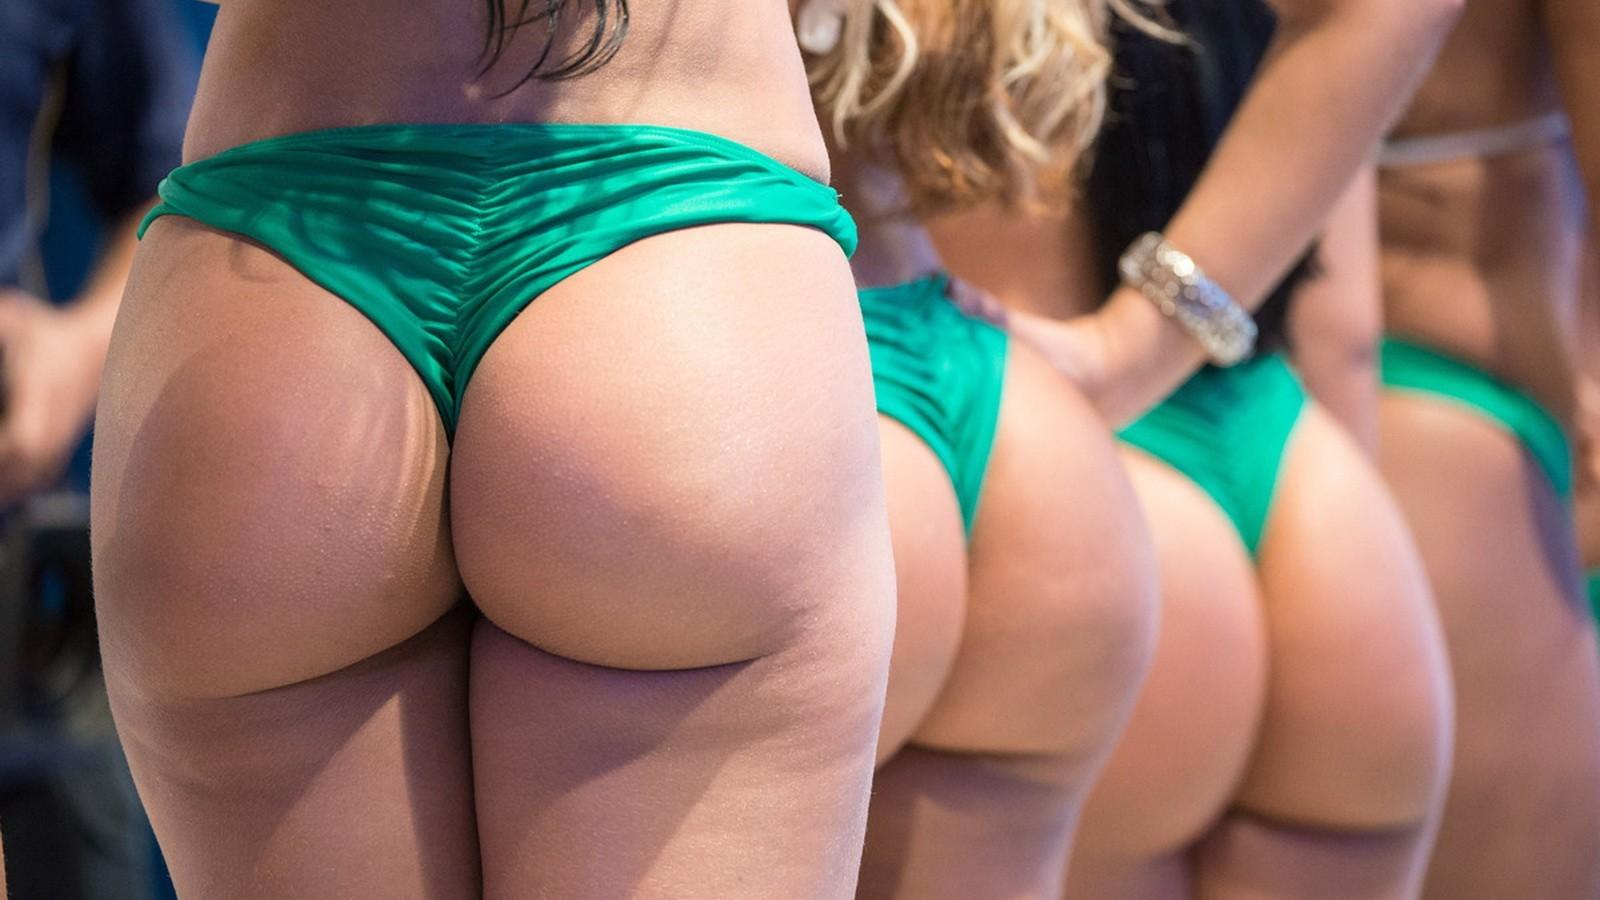 seks-tri-brazilskie-popki-russkoe-porno-v-kozhanom-plate